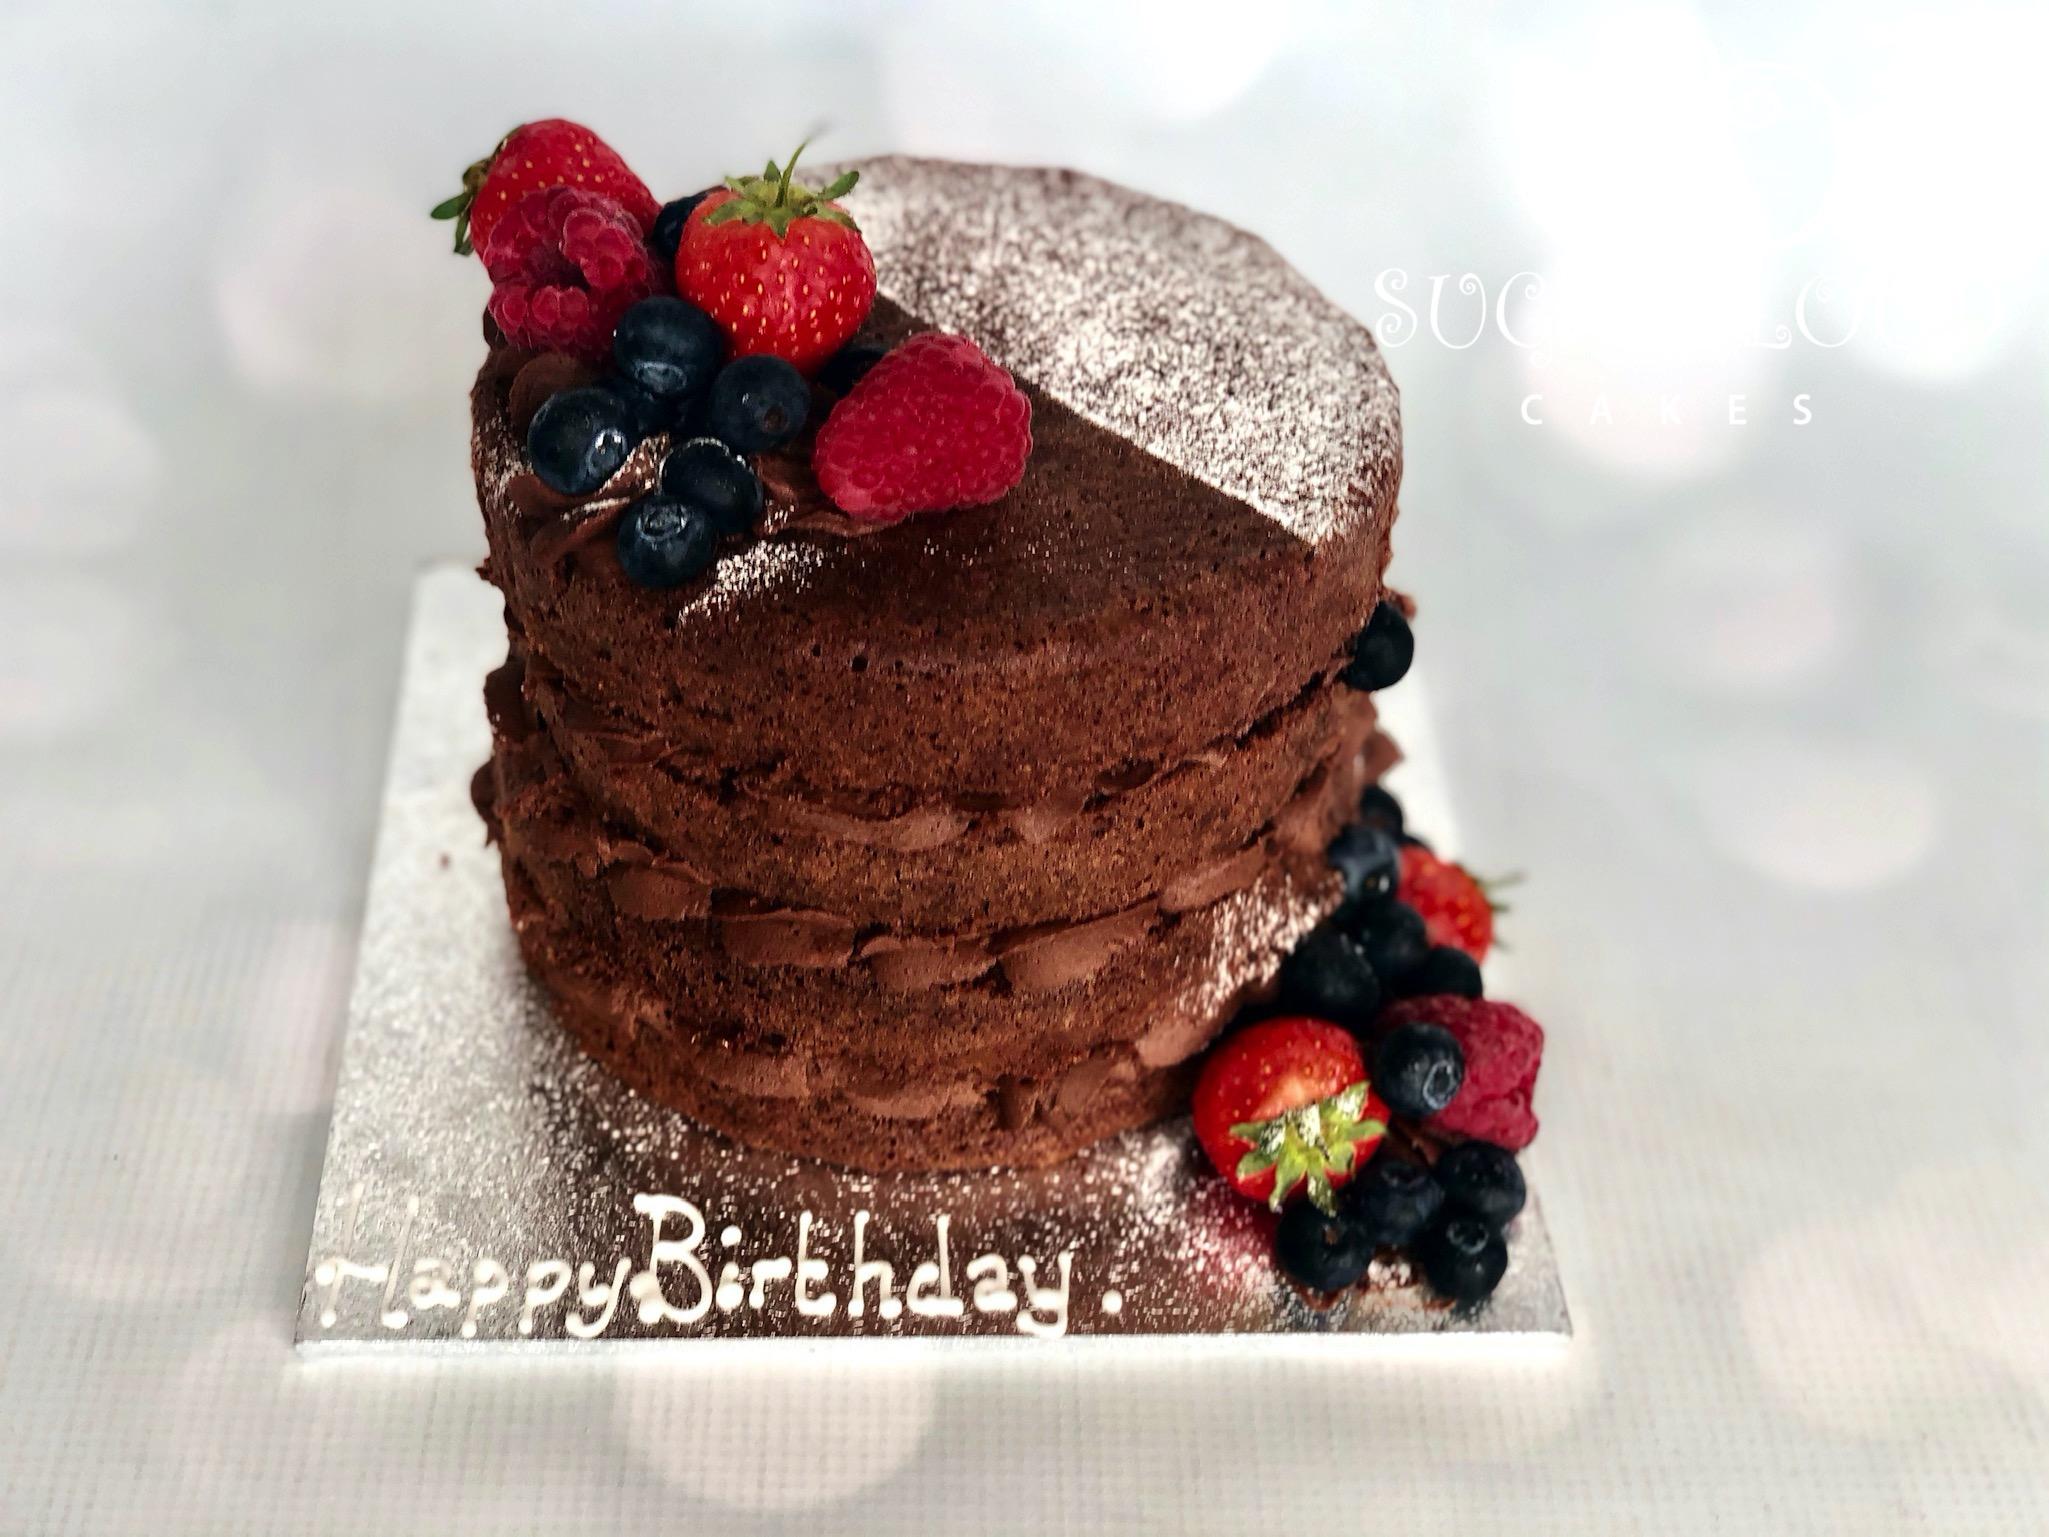 A Chocolate Orange and Fruit Birthday Cake, Sandbach